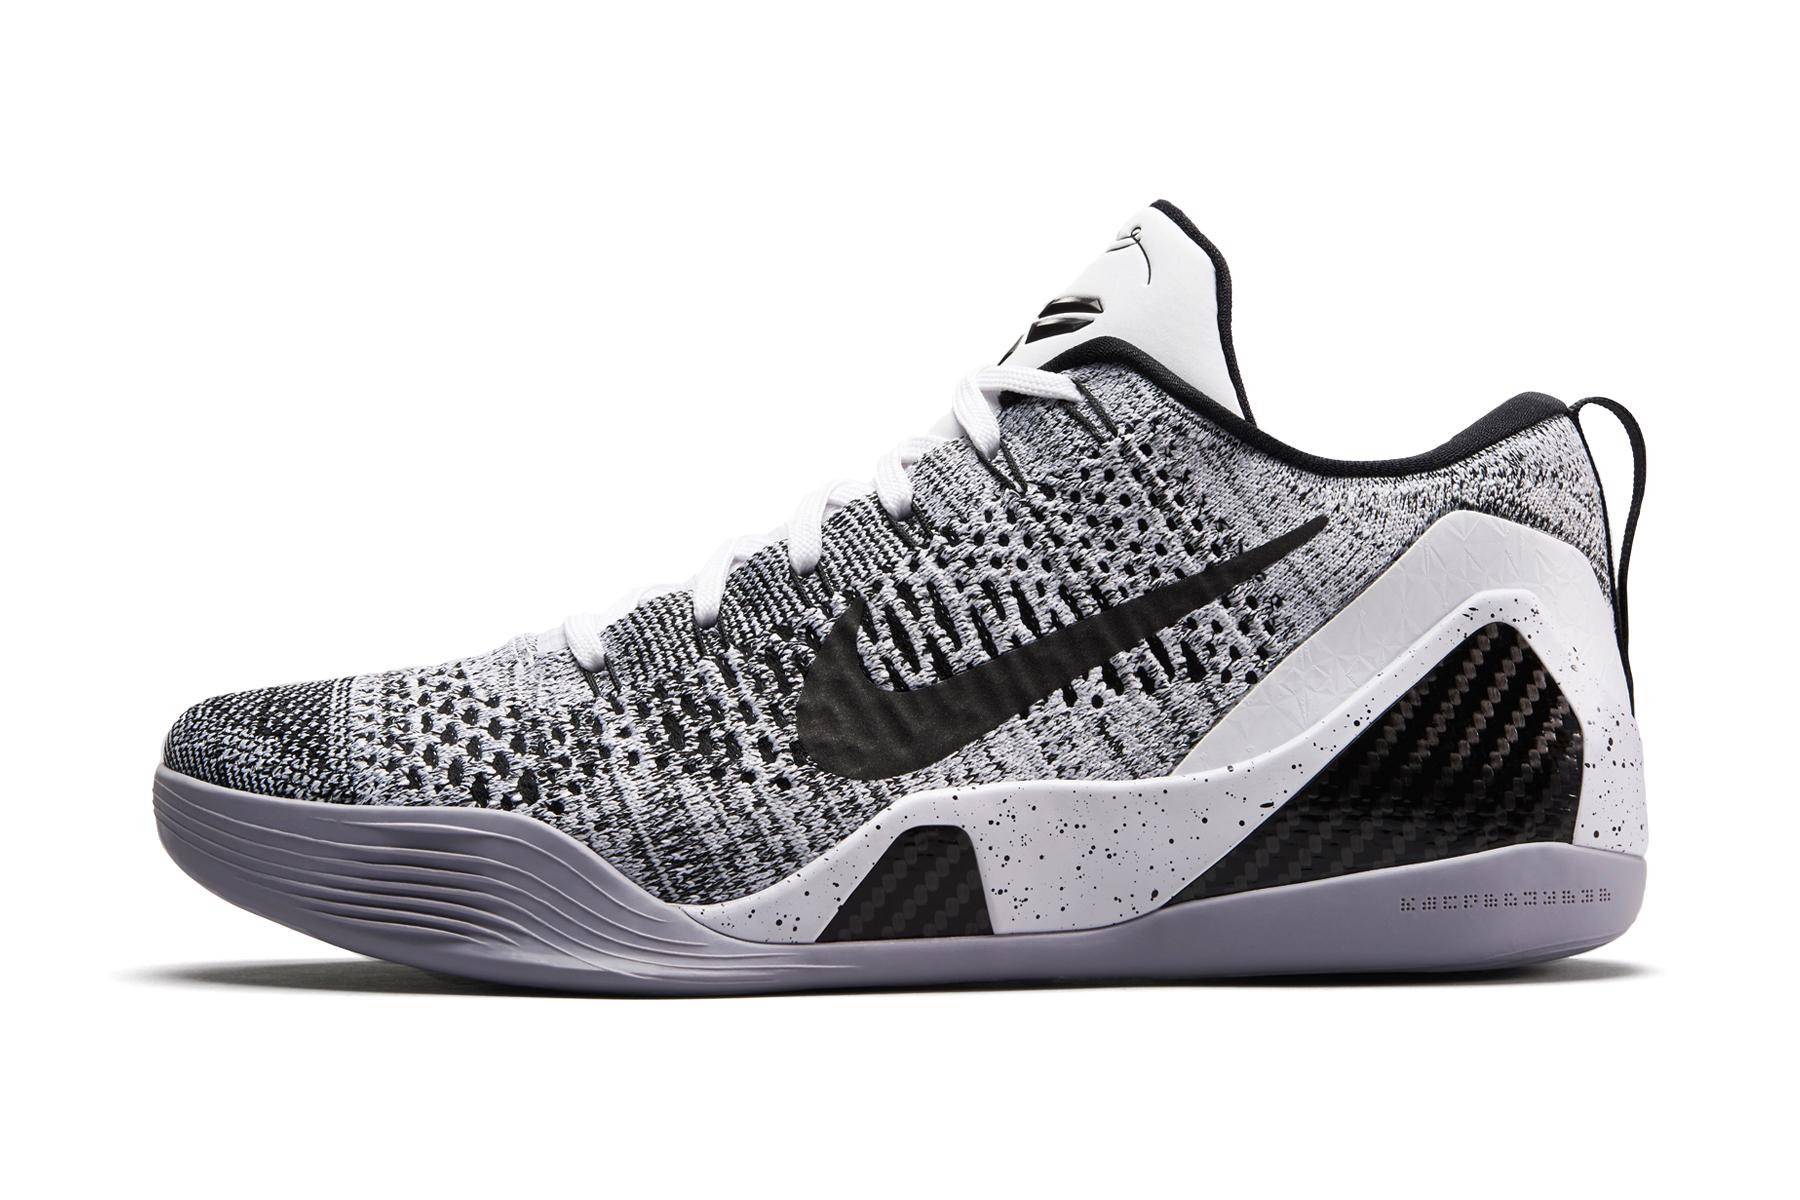 Nike Debuts the Kobe 9 Elite Low